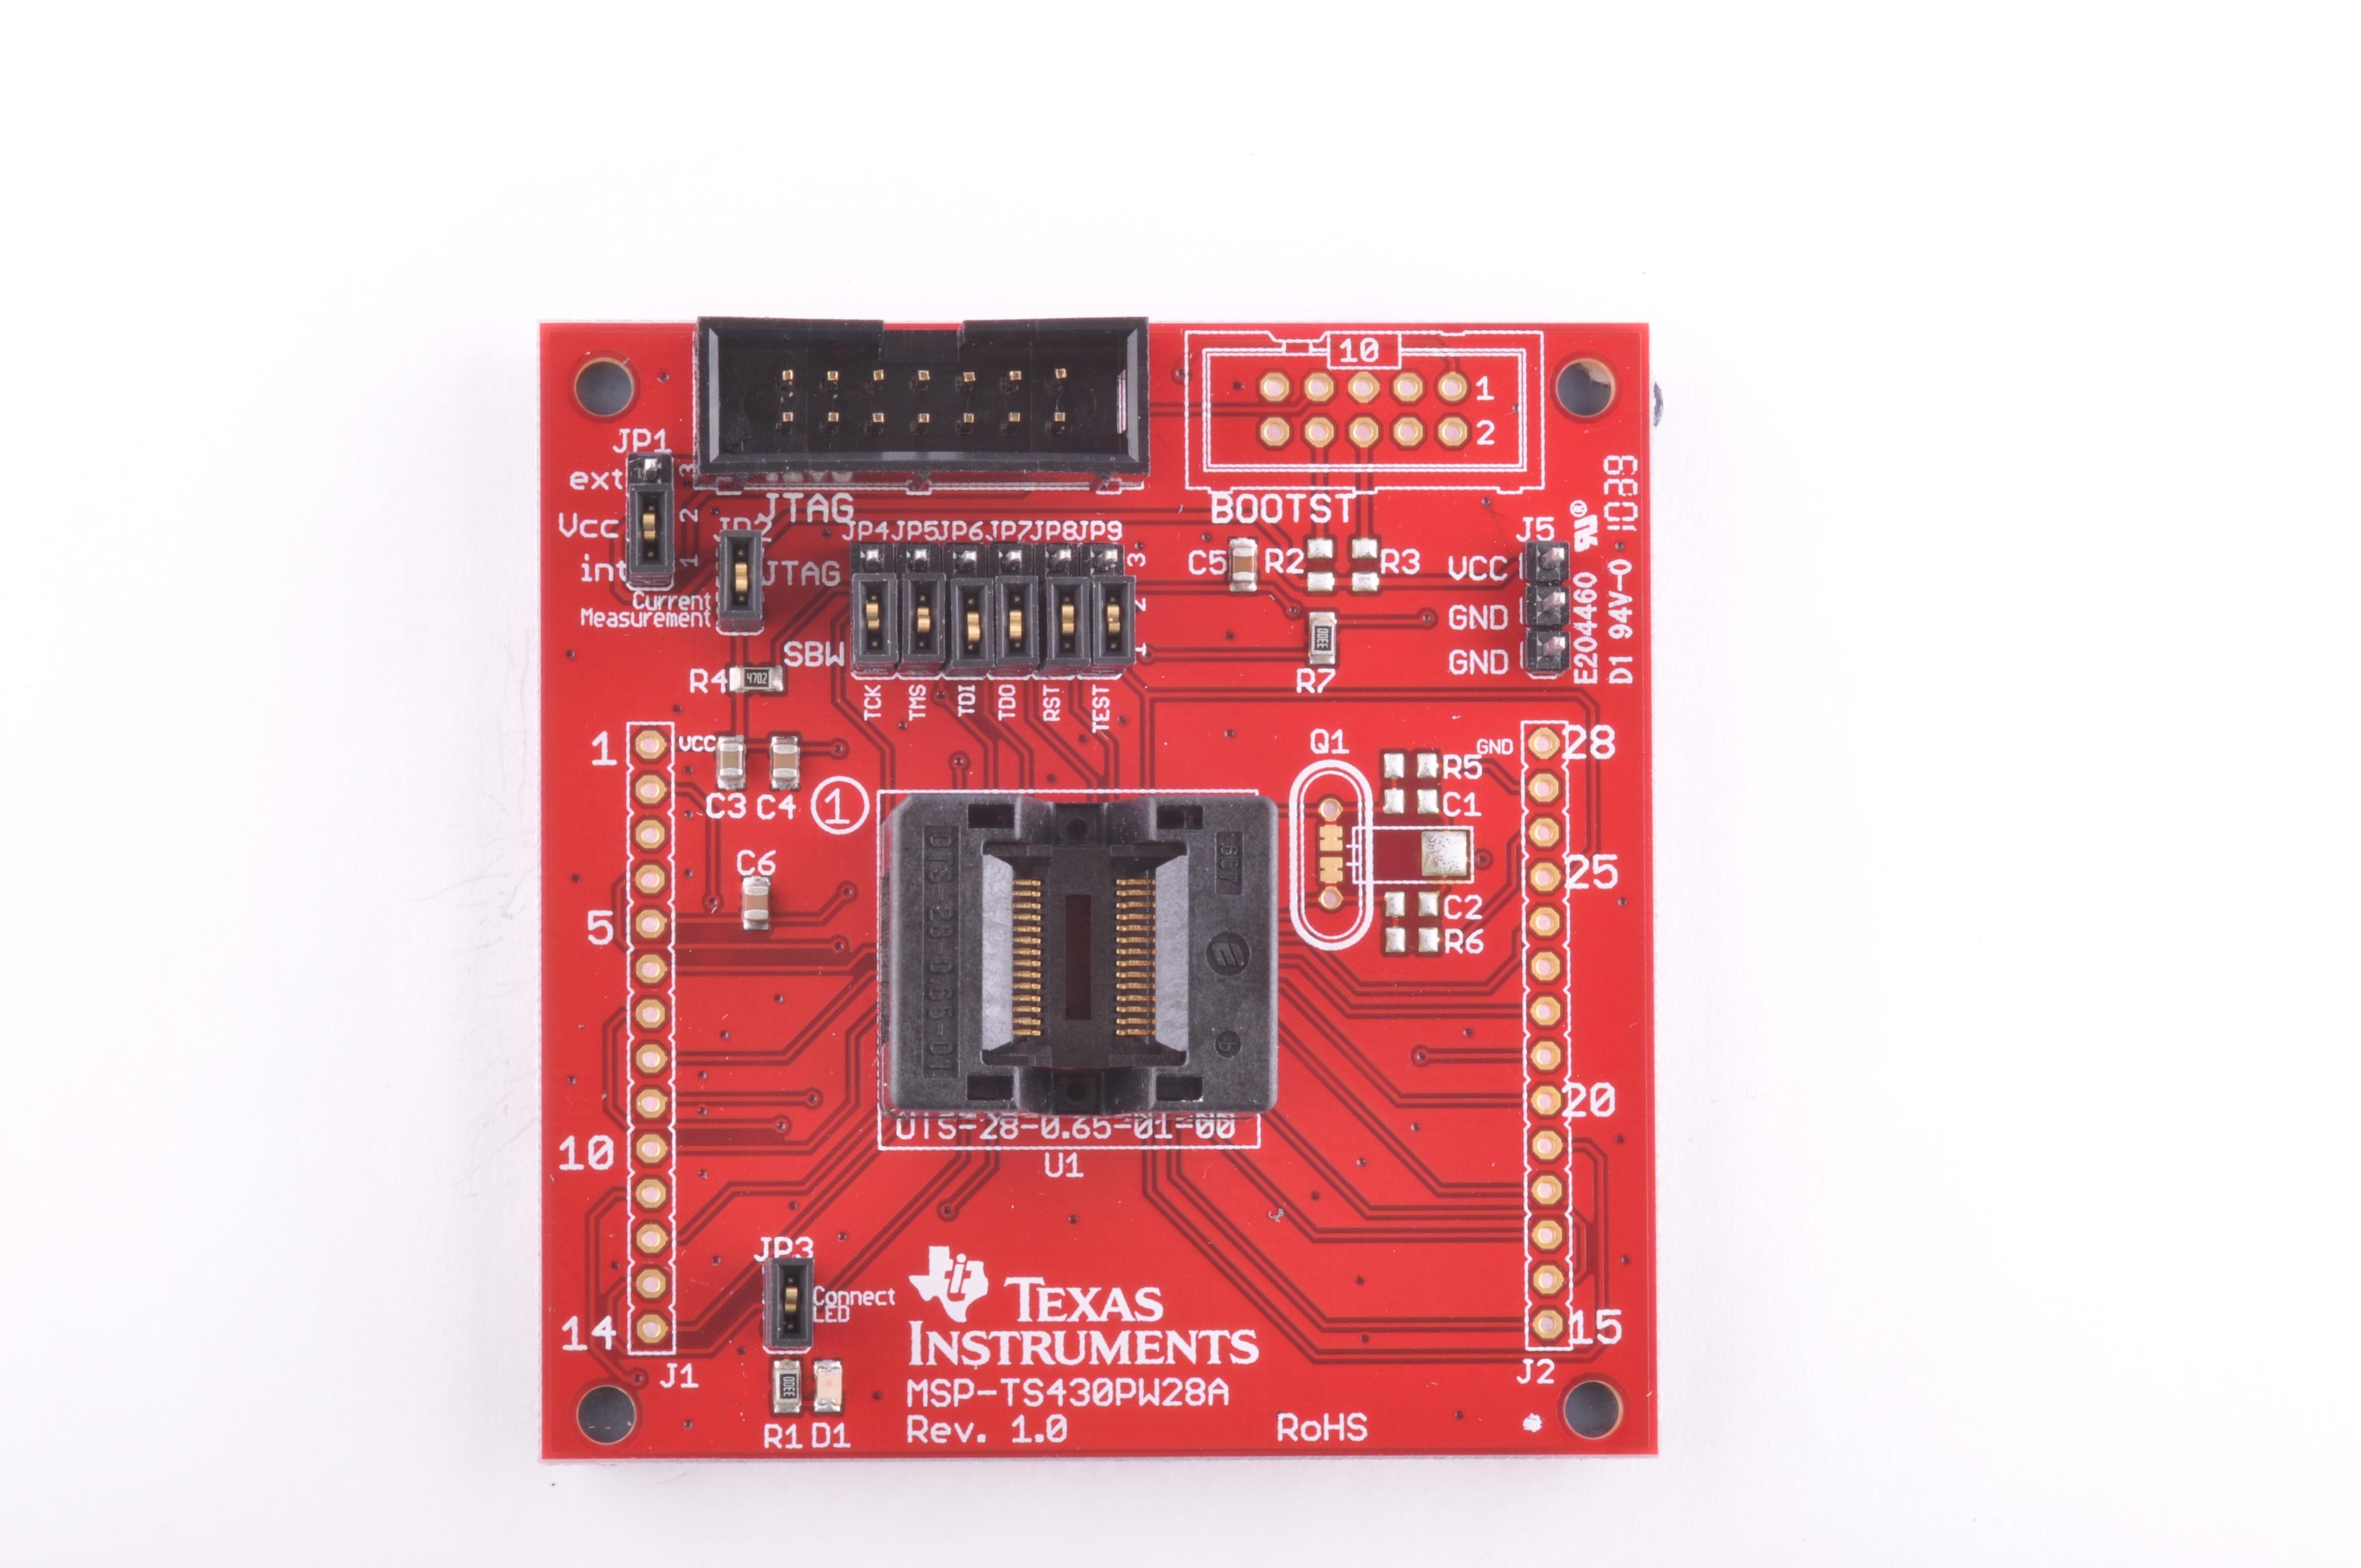 Msp Ts430pw28a 28 Pin Target Development Board For My Jfet Quartz Oscillator Public Circuit Online Simulator Description